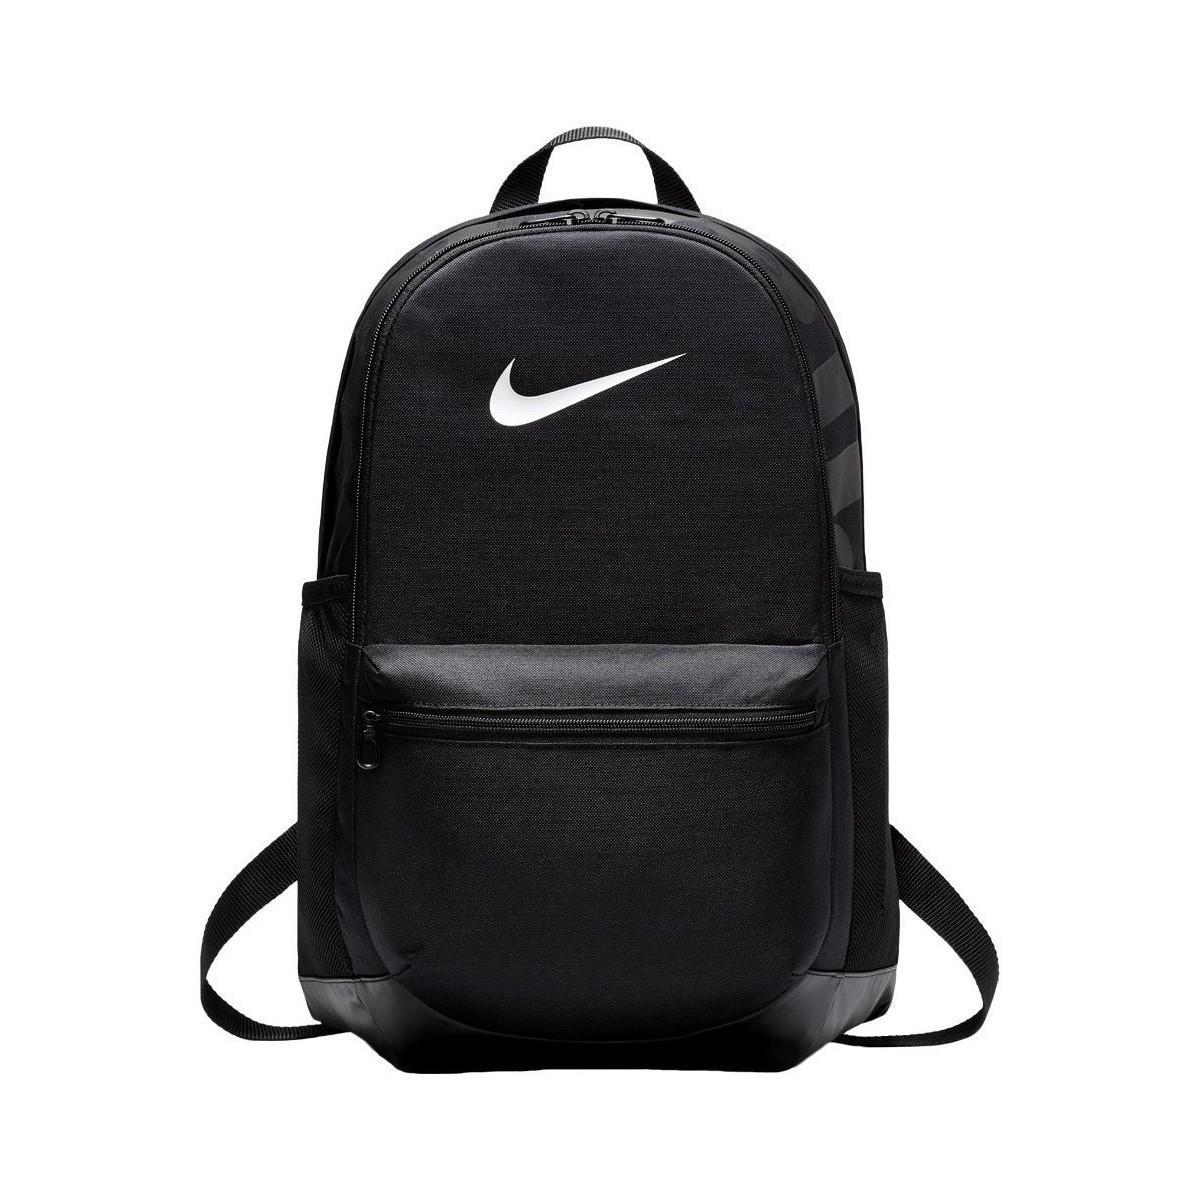 2a00ad5c3865 Nike Brasilia Women s Backpack In Black in Black - Lyst